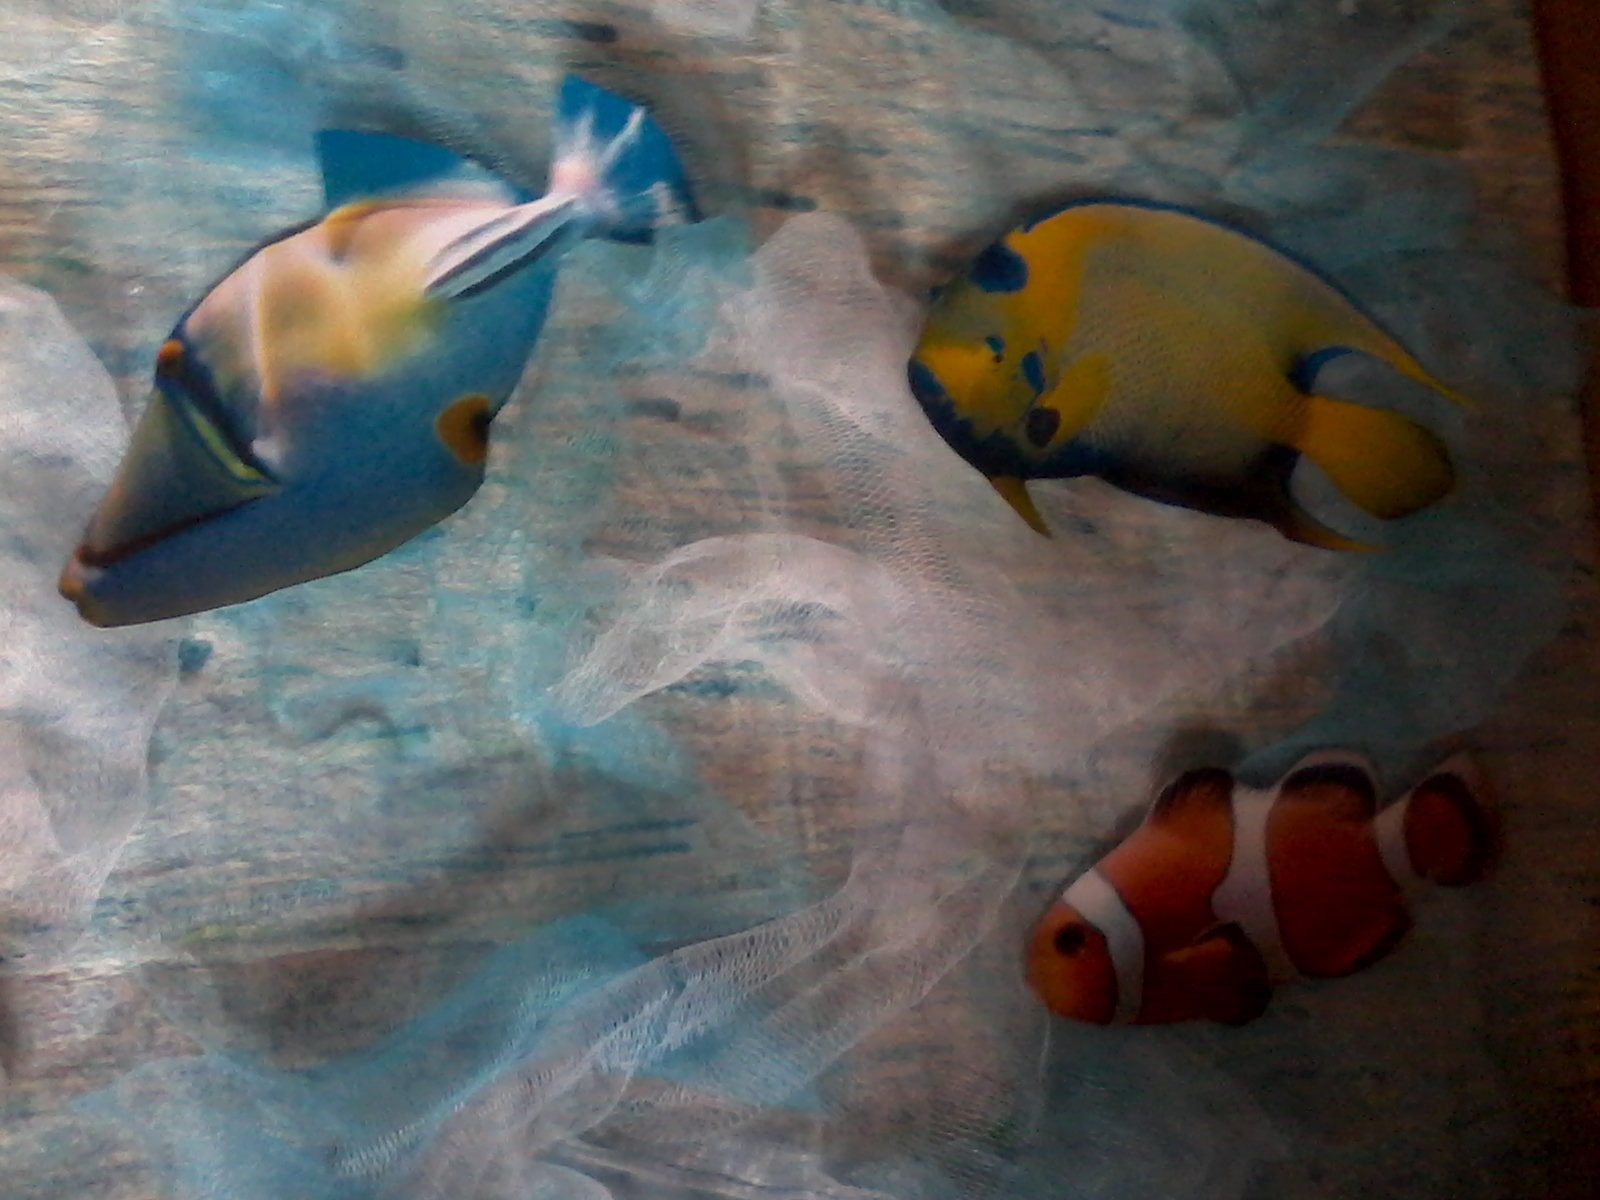 Forever wedding planner come creare un tableau de mariage for Creare pesci